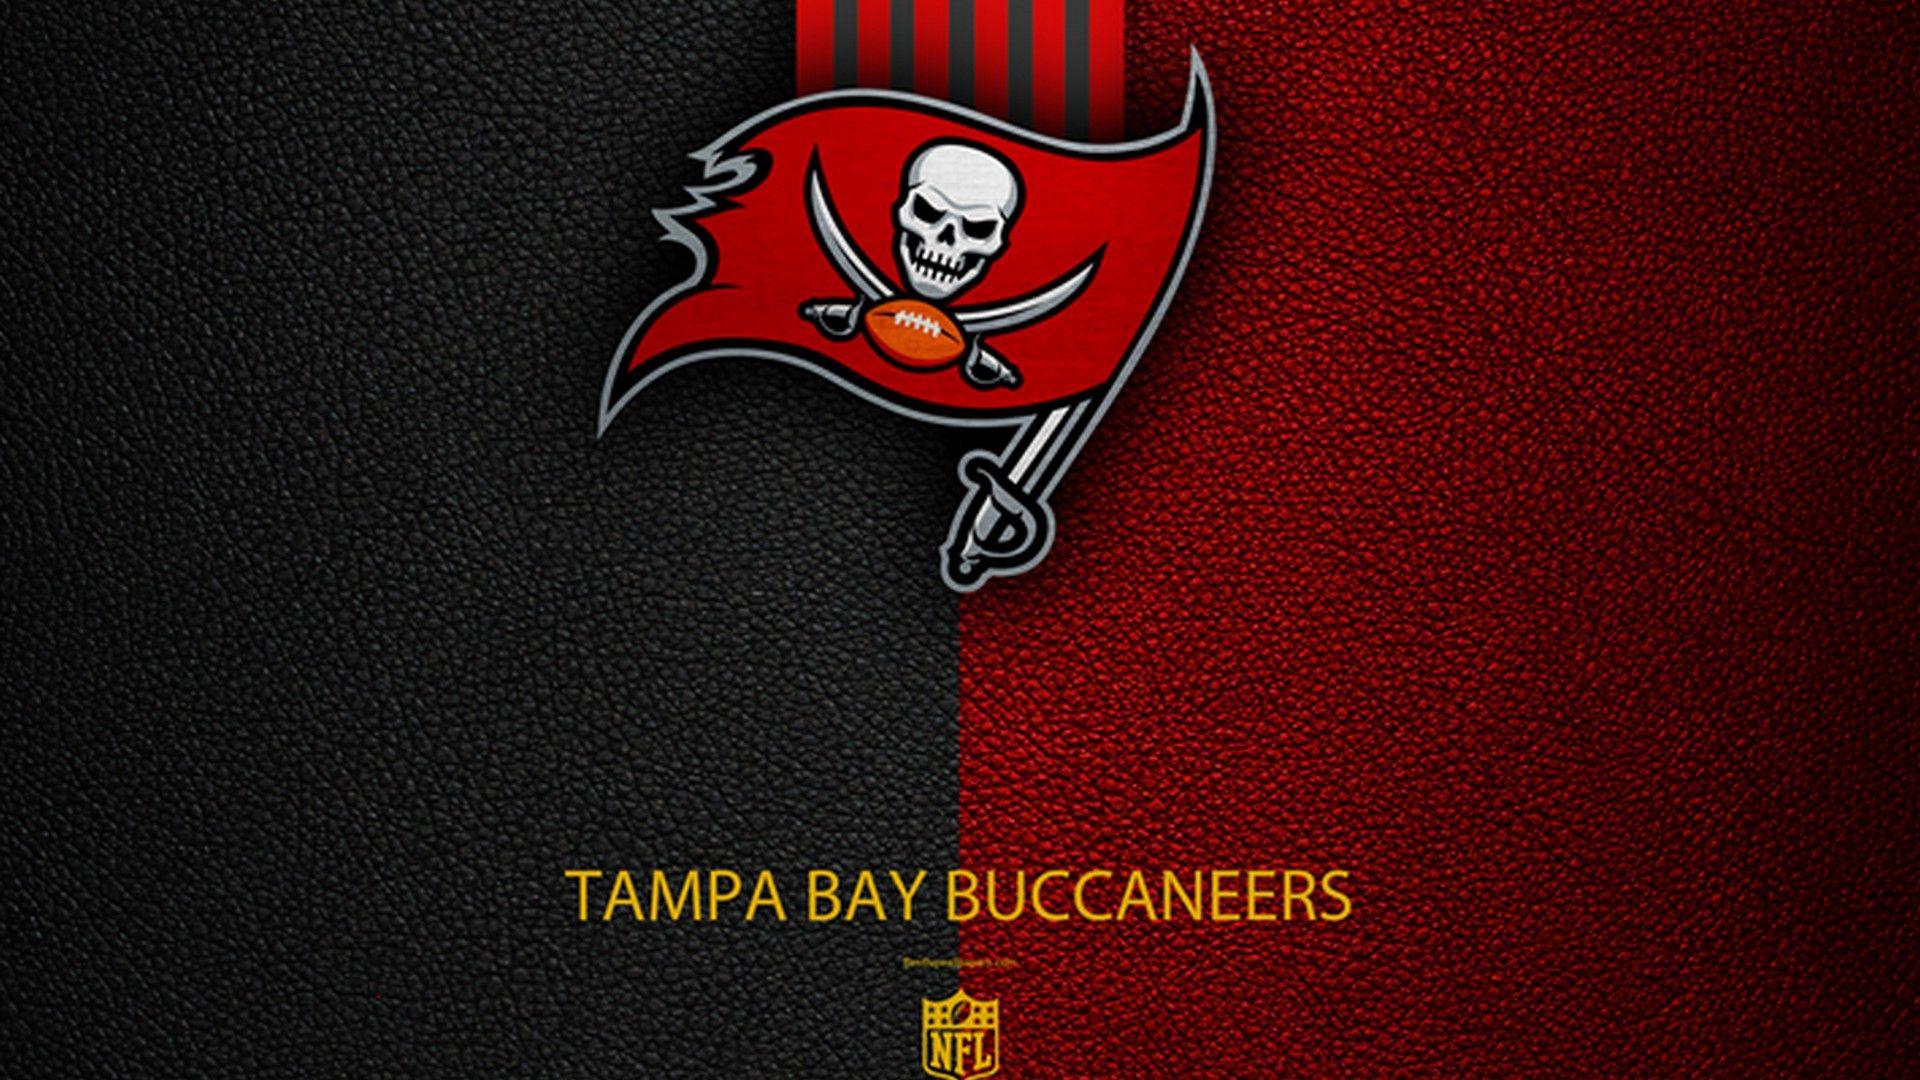 Tampa Bay Buccaneers Wallpaper For Mac Backgrounds 2020 Nfl Football Wallpapers Nfl Football Wallpaper Tampa Bay Buccaneers American Football